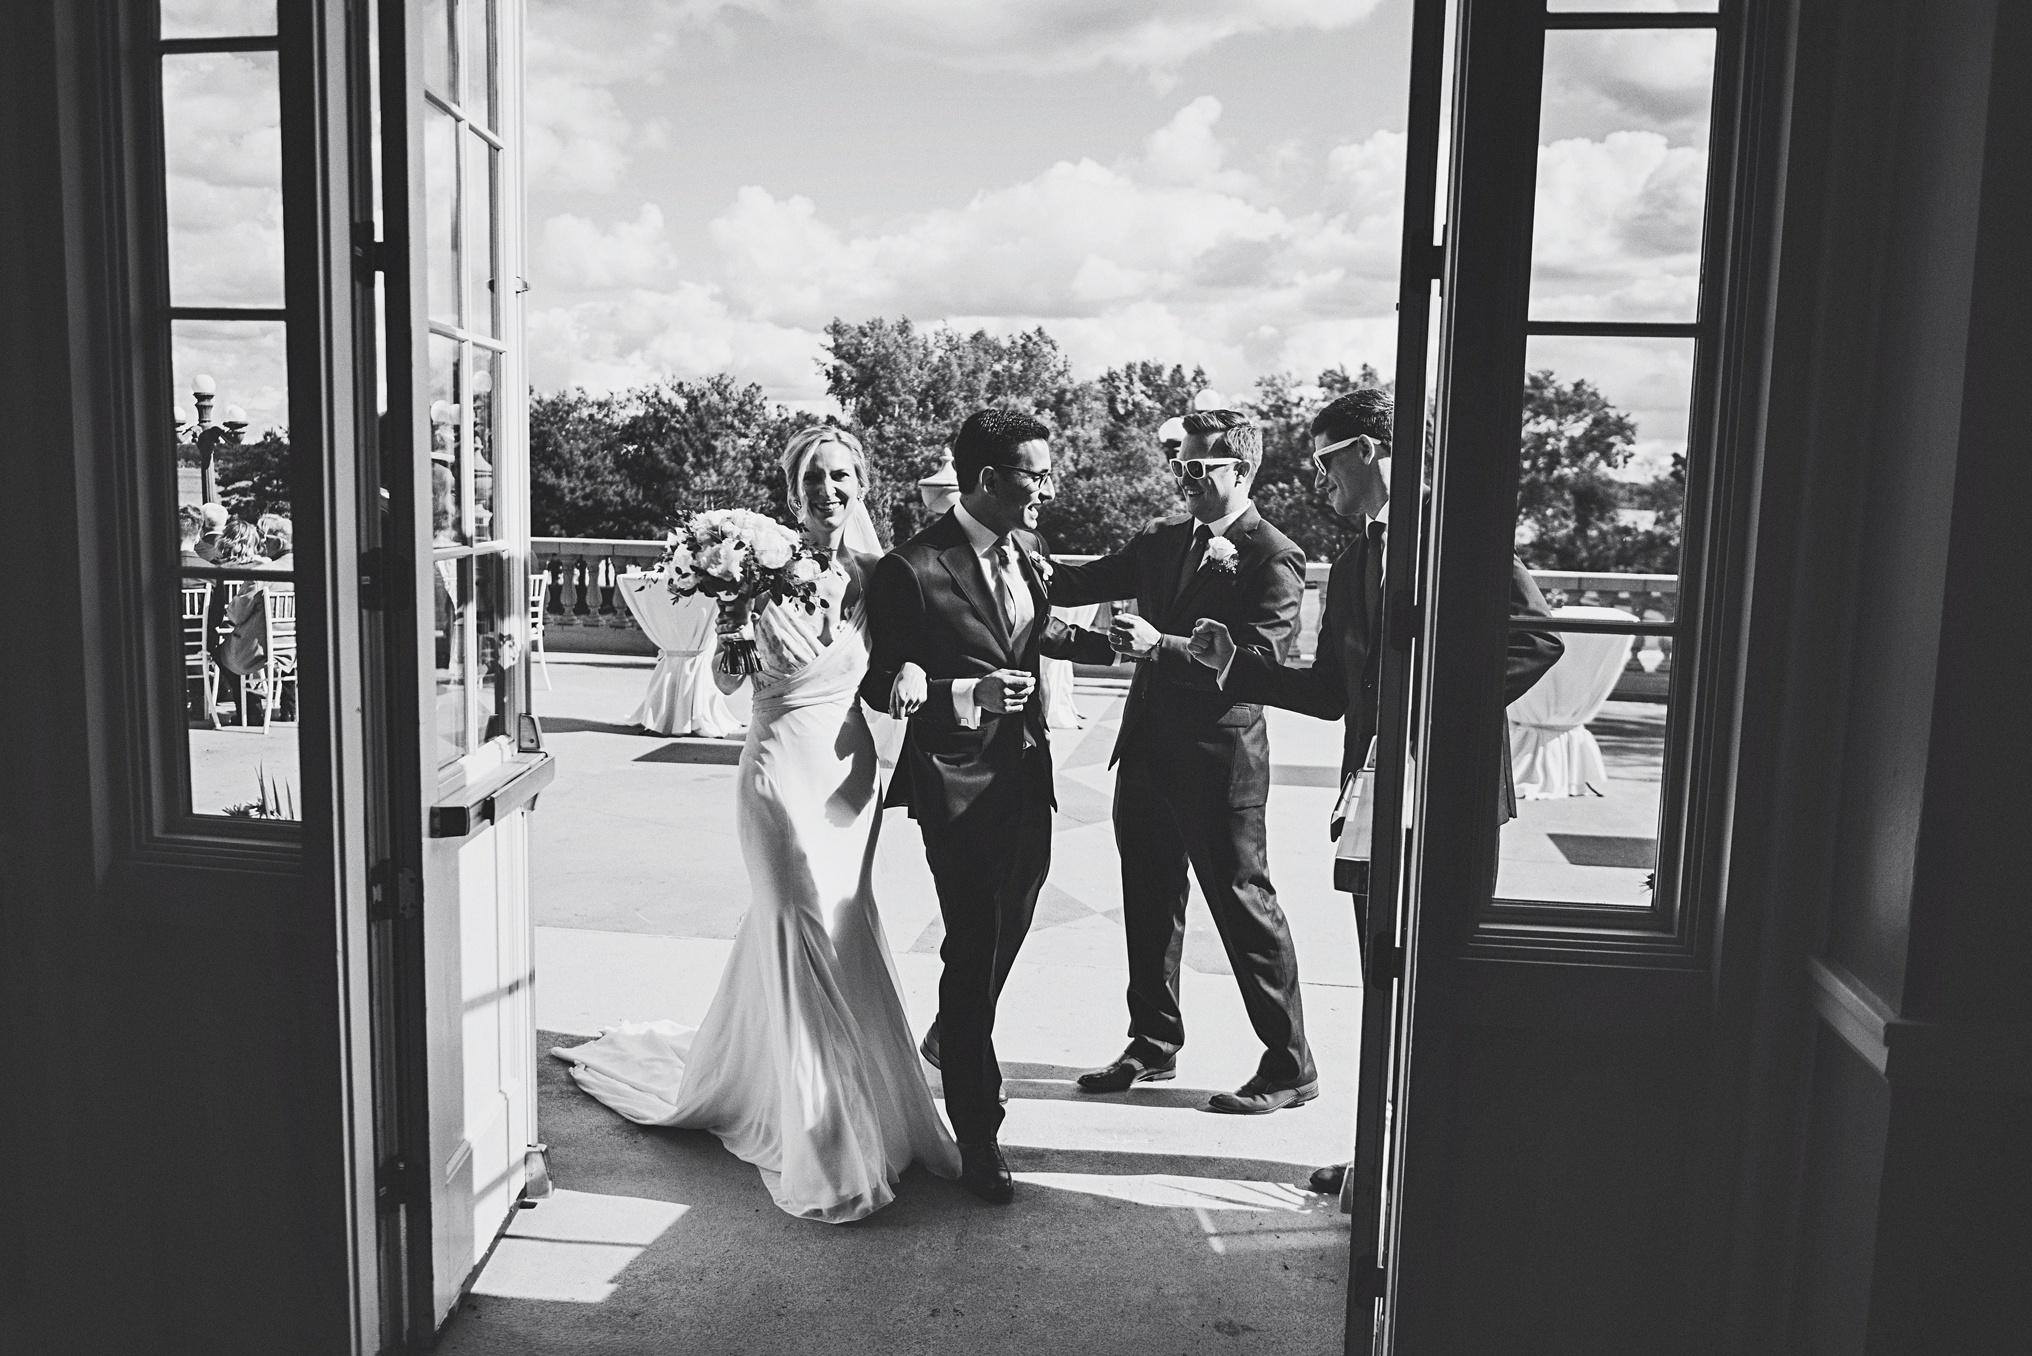 best_wedding_photography_2017_by_lucas_botz_photography_218.jpg